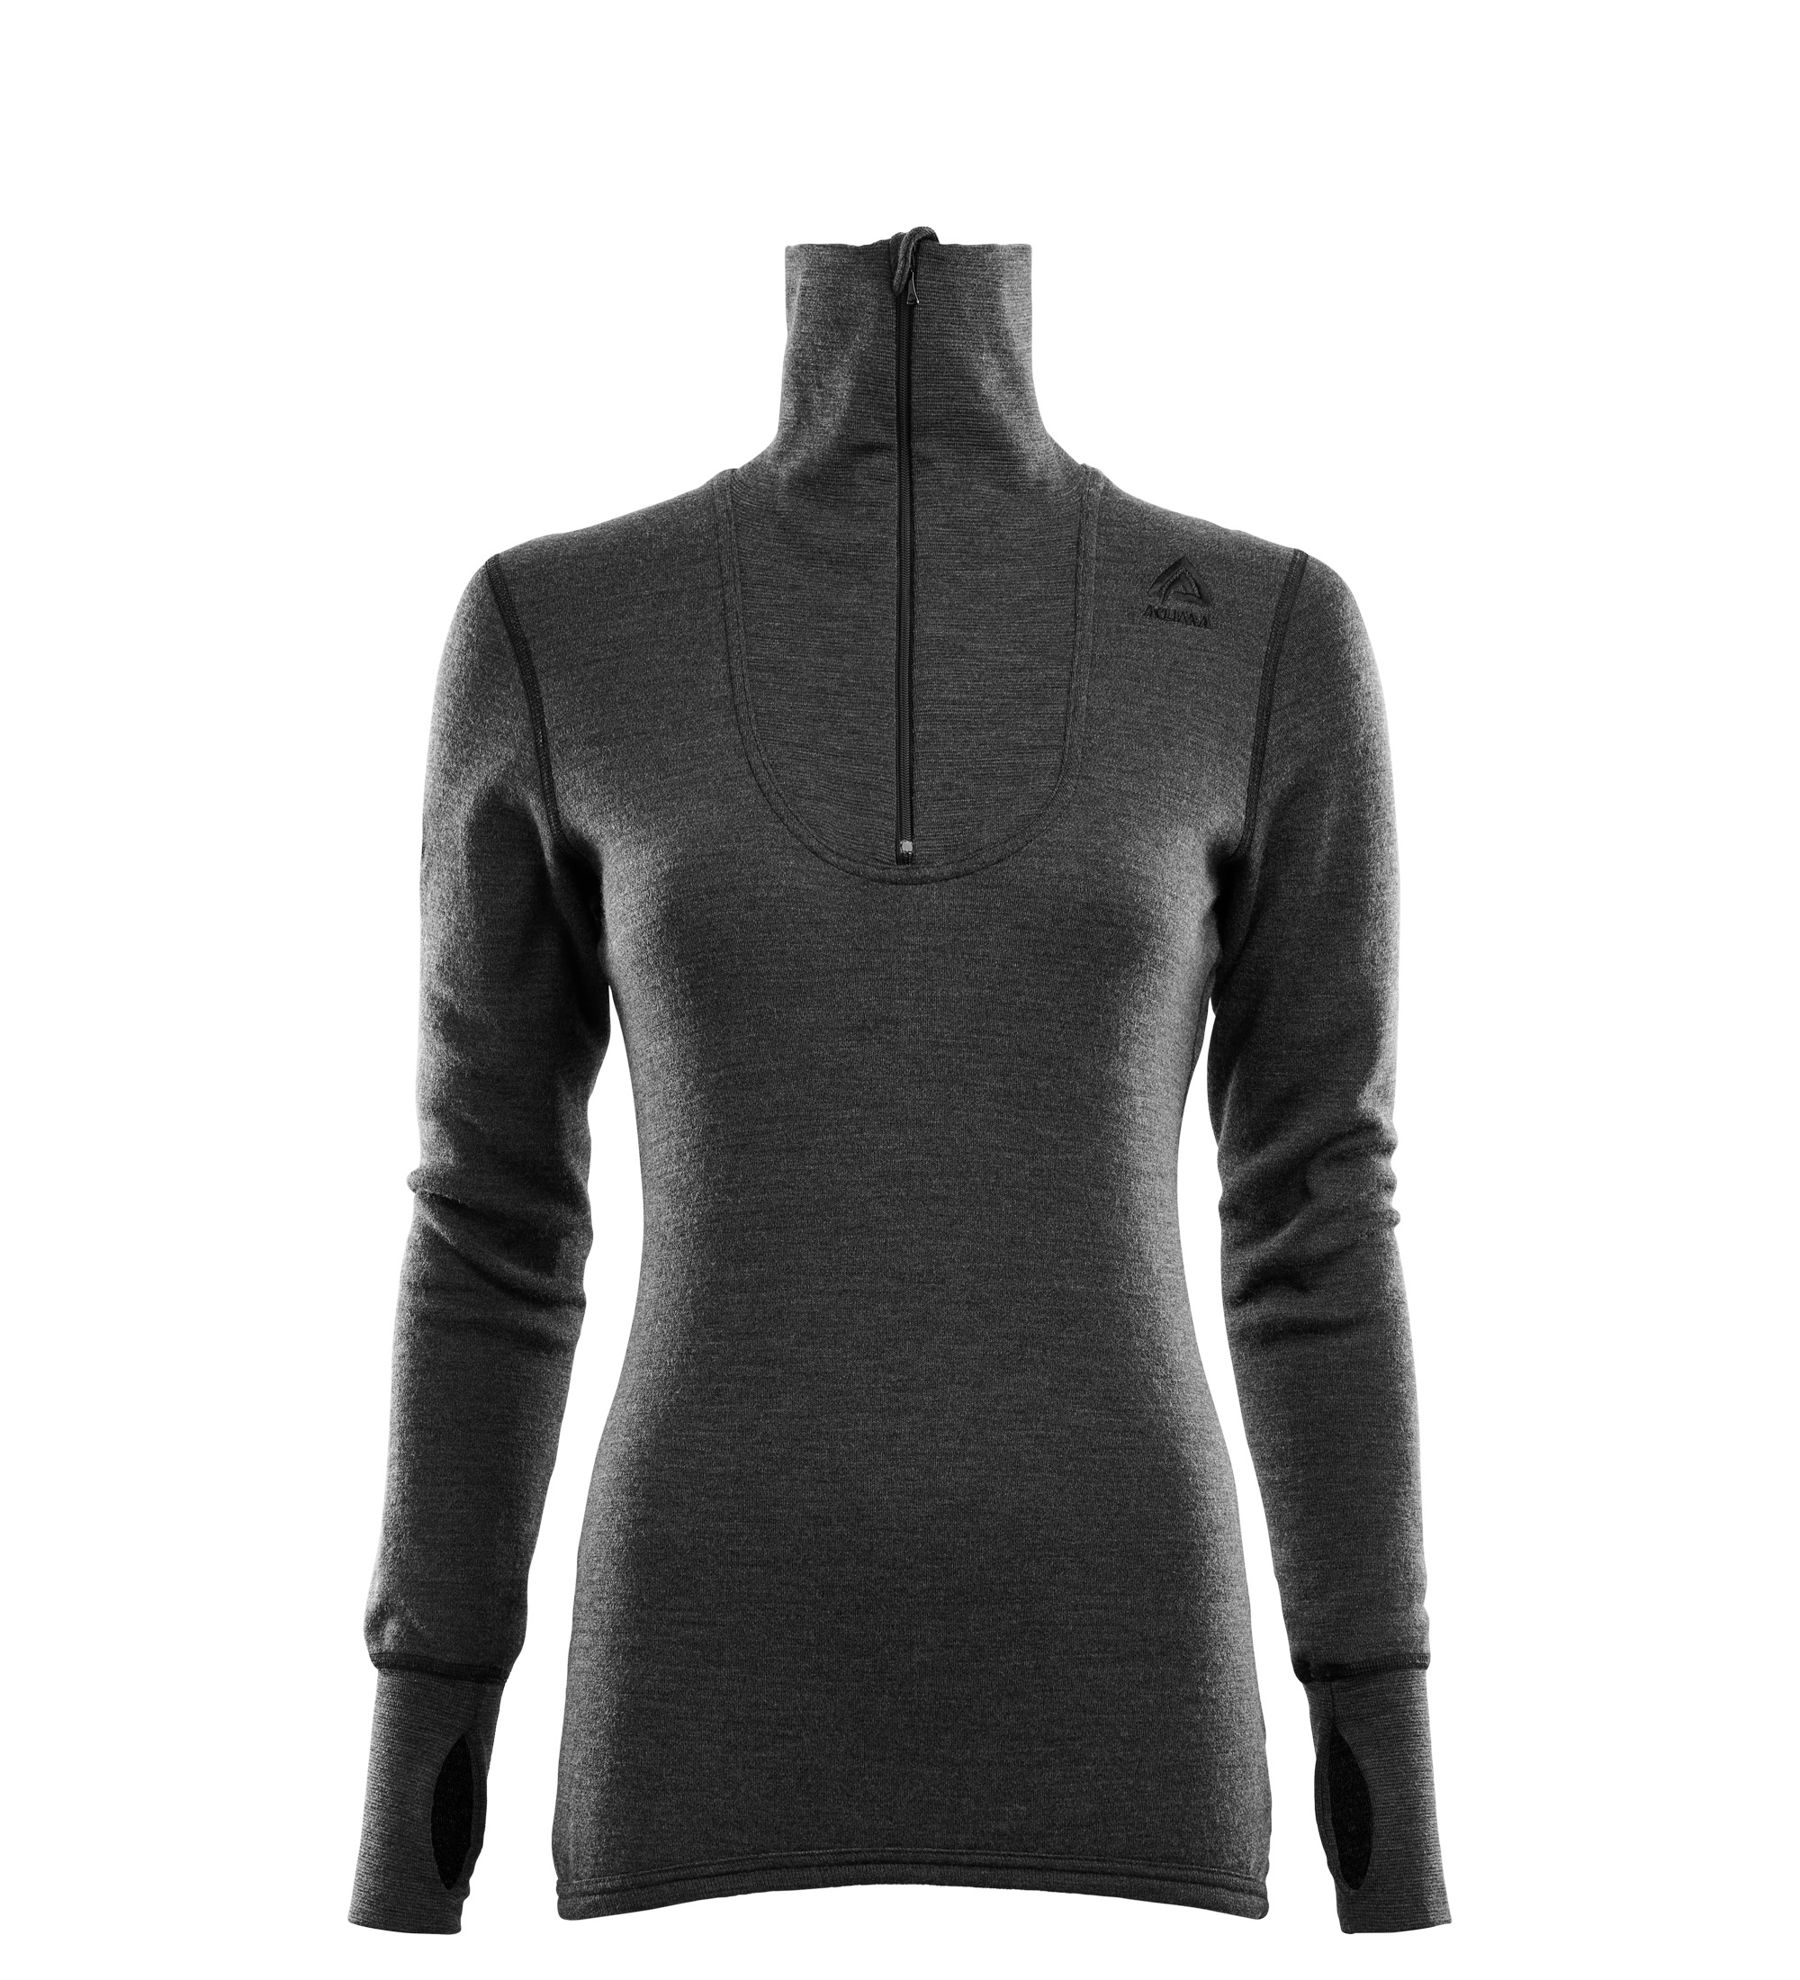 Fr�n Norska Aclima kommer DoubleWool Polo Shirt zip, Wom i finaste Merinoull. F�rgen heter Marengo/Jet Black och finns i storlek: XS-2XL. Passar b�st till Dam